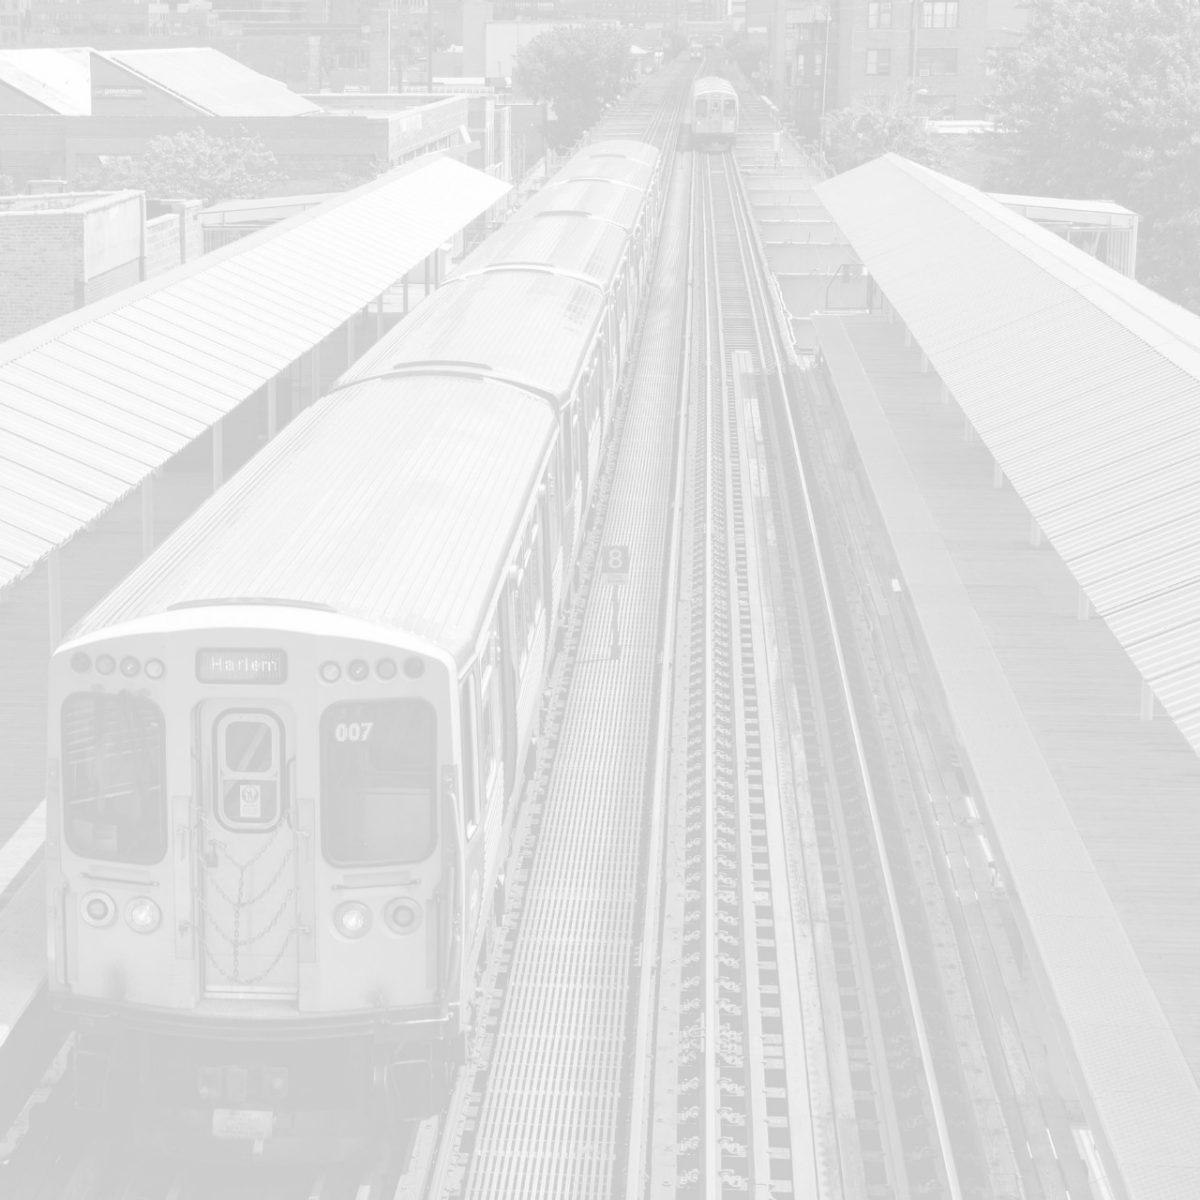 elevated-railway-train-at-ashland-avenue-station-chicago